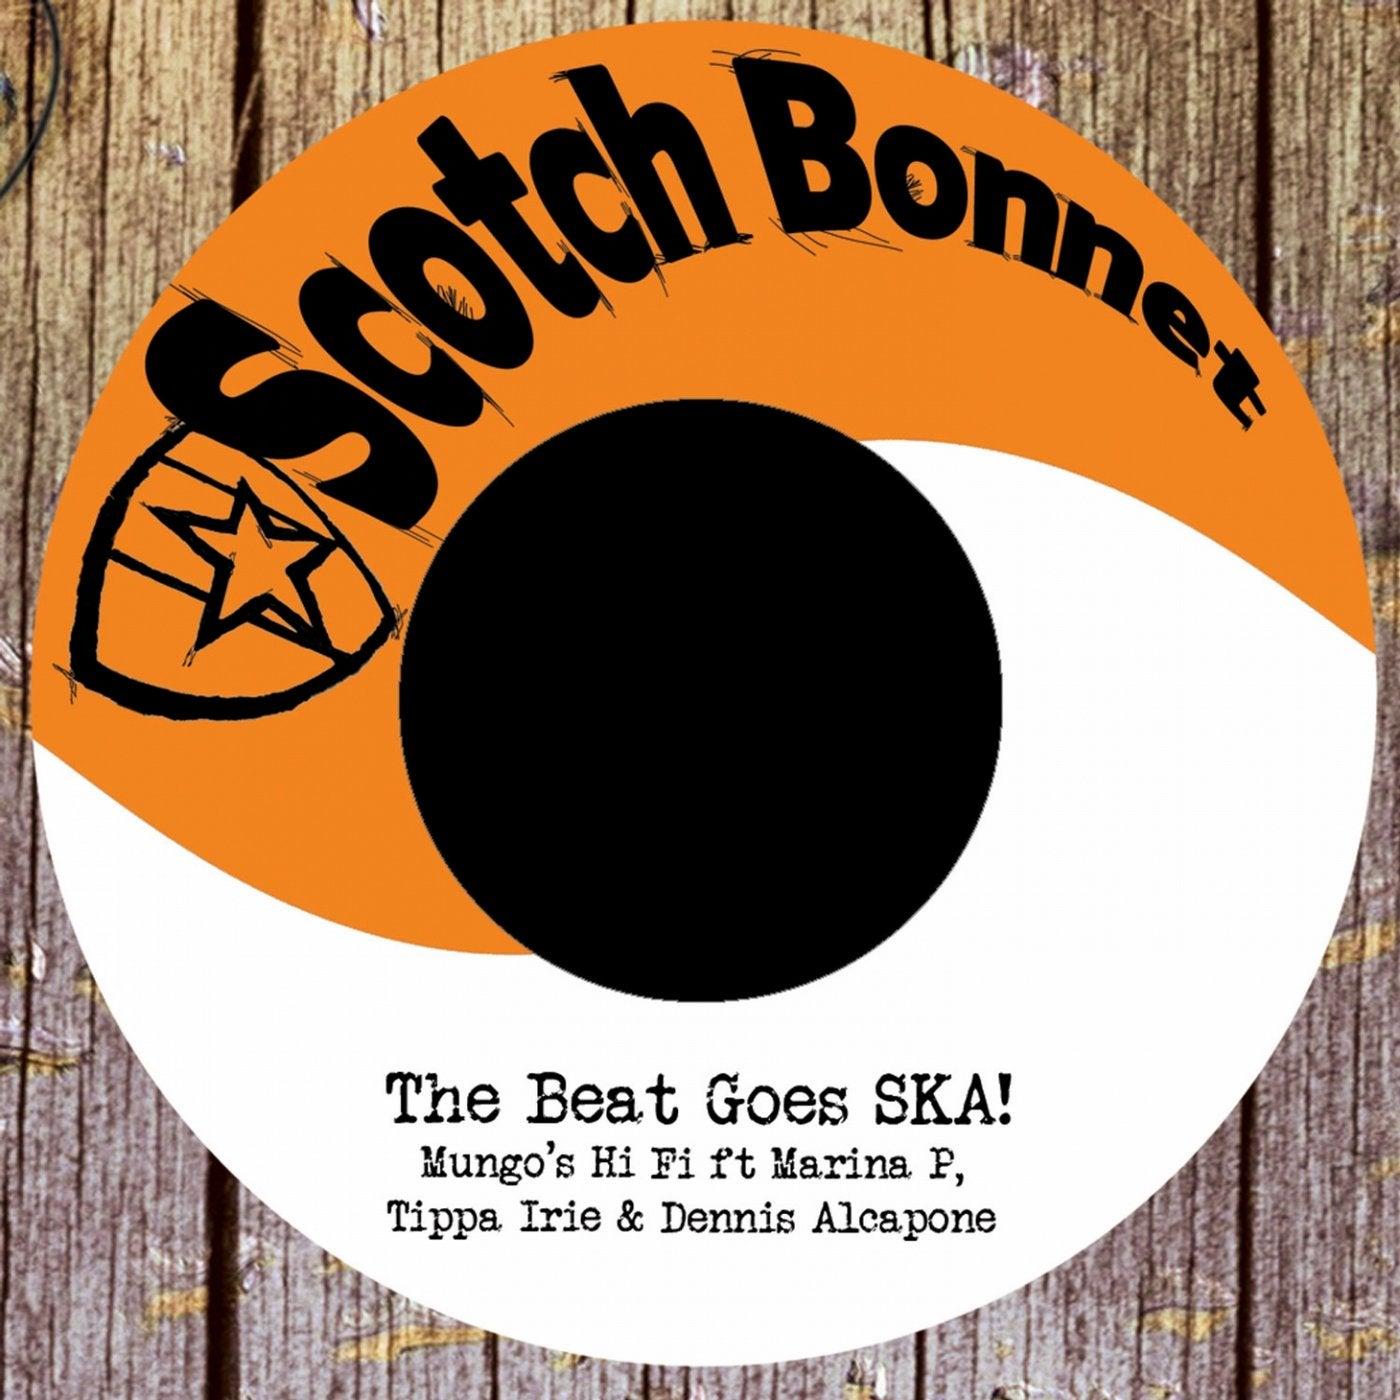 The Beat Goes SKA! feat. Tippa Irie, Dennis Alcapone (Original Mix)